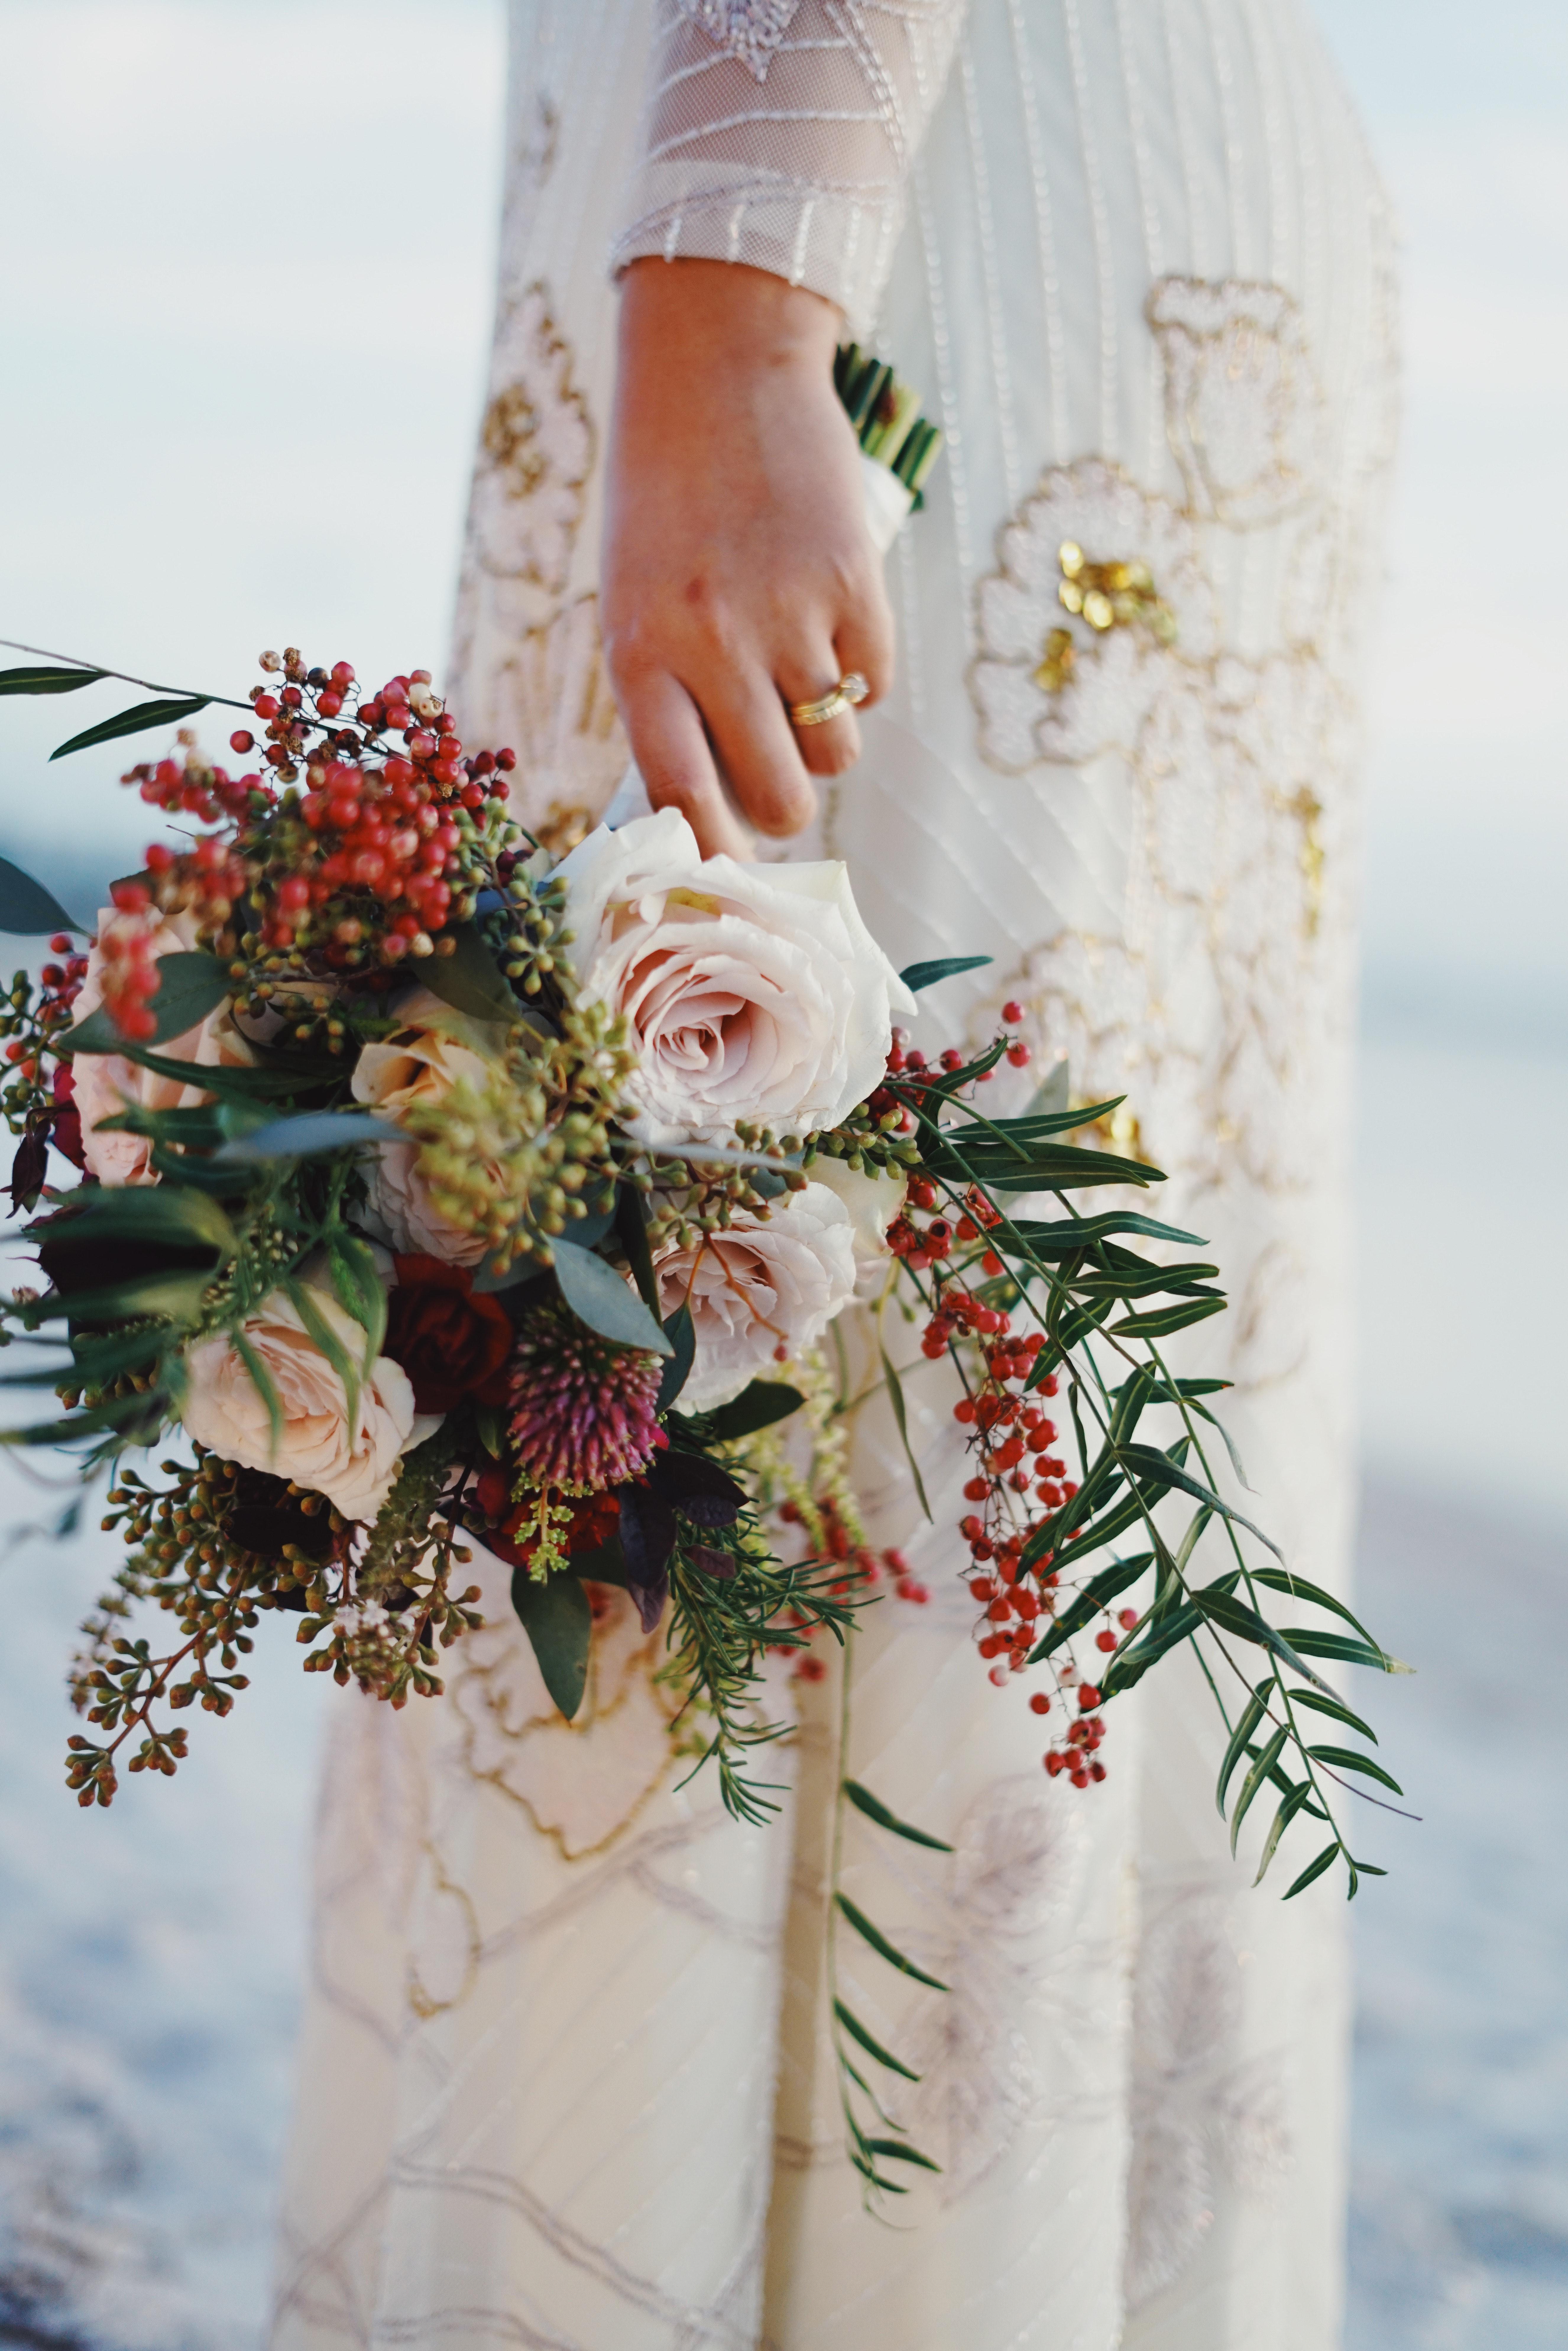 Woman Holding Bouquet of Flowers, Adult, Flowers, Wedding dress, Wedding, HQ Photo